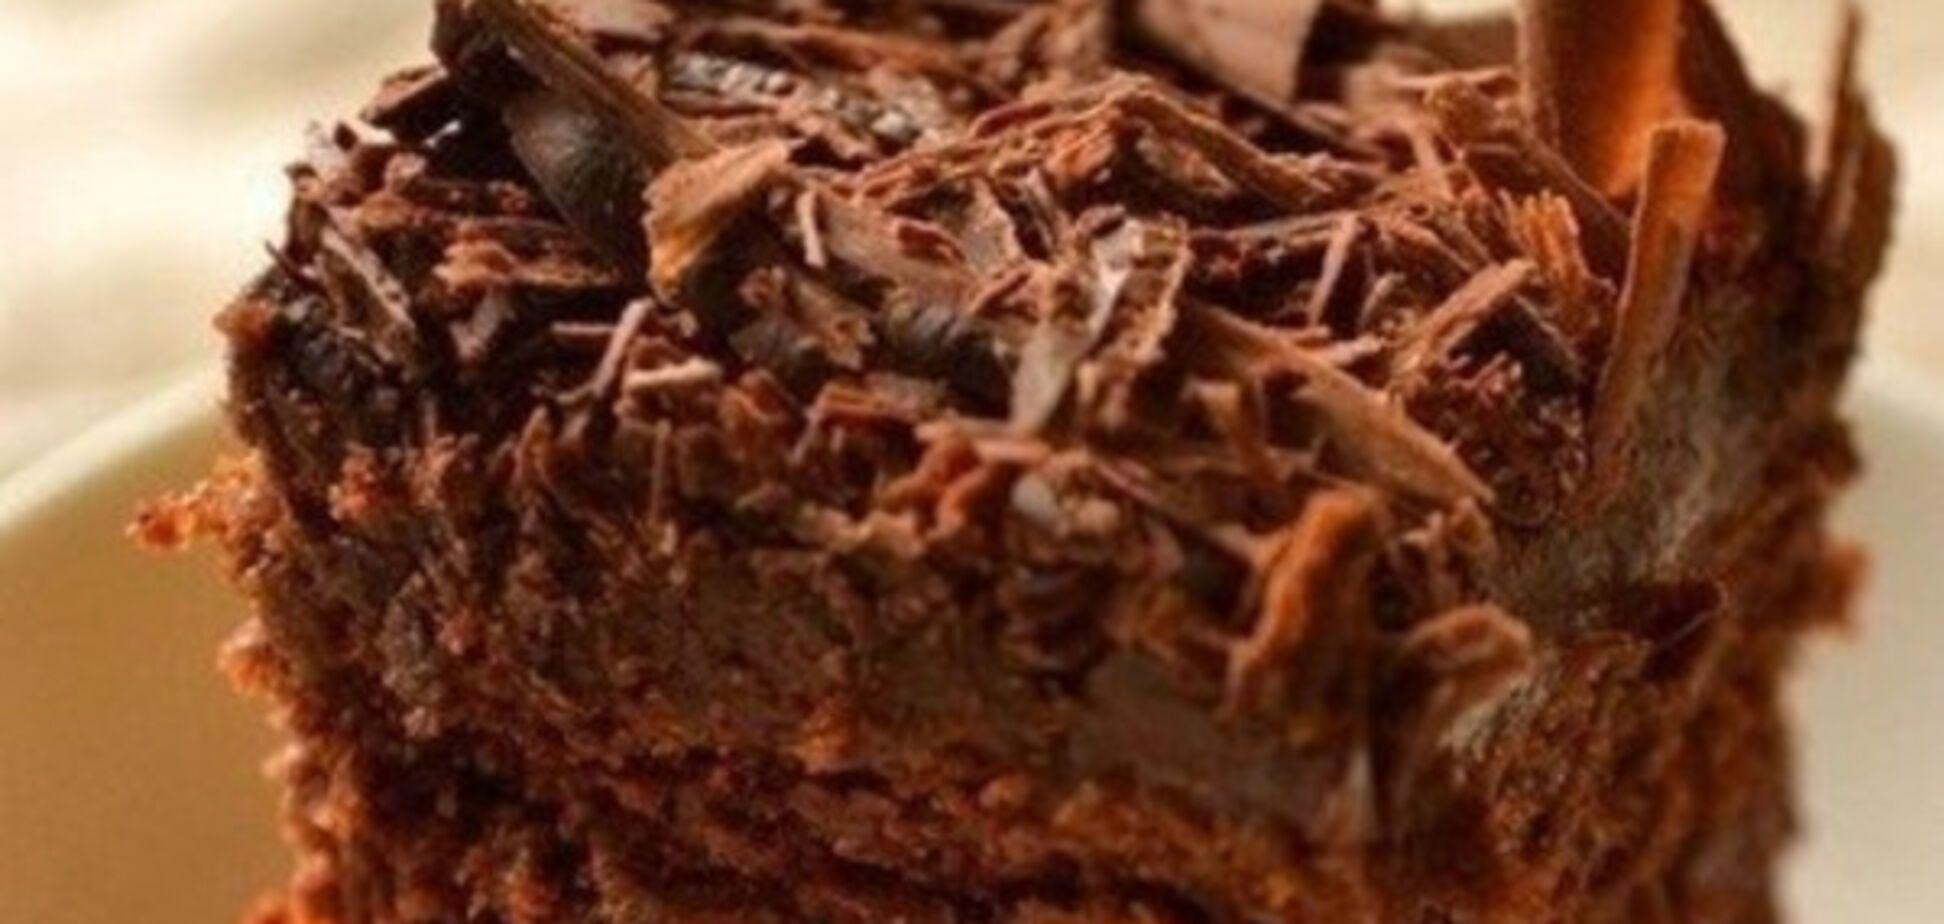 Само совершенство: рецепт сочного шоколадного пирога без яиц